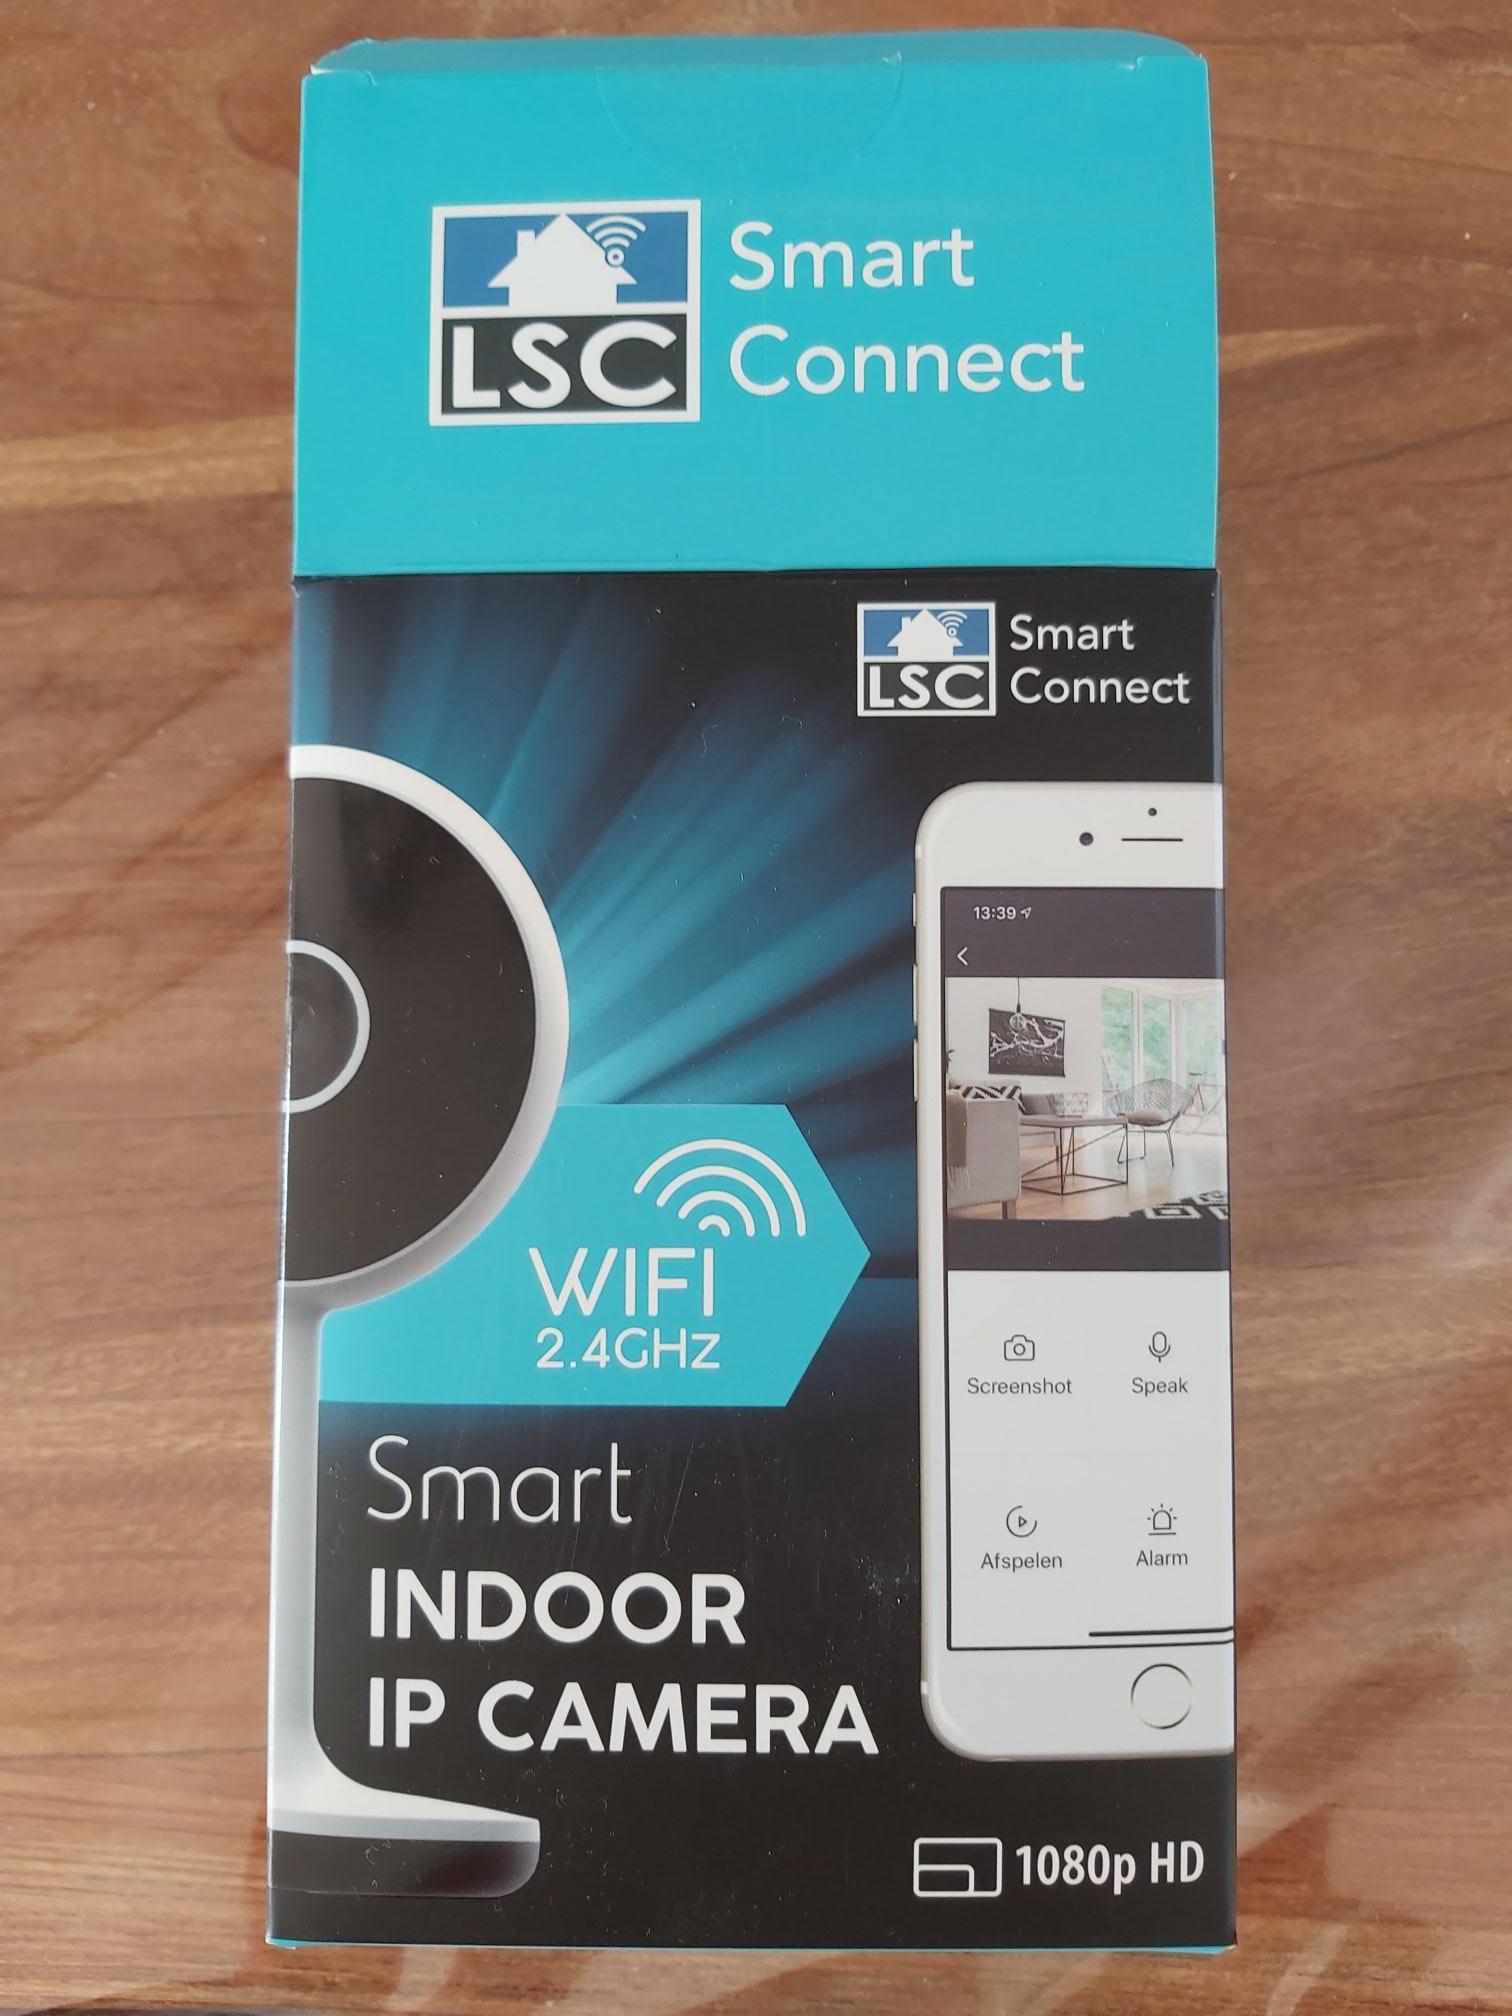 LSC indoor ip camera full hd